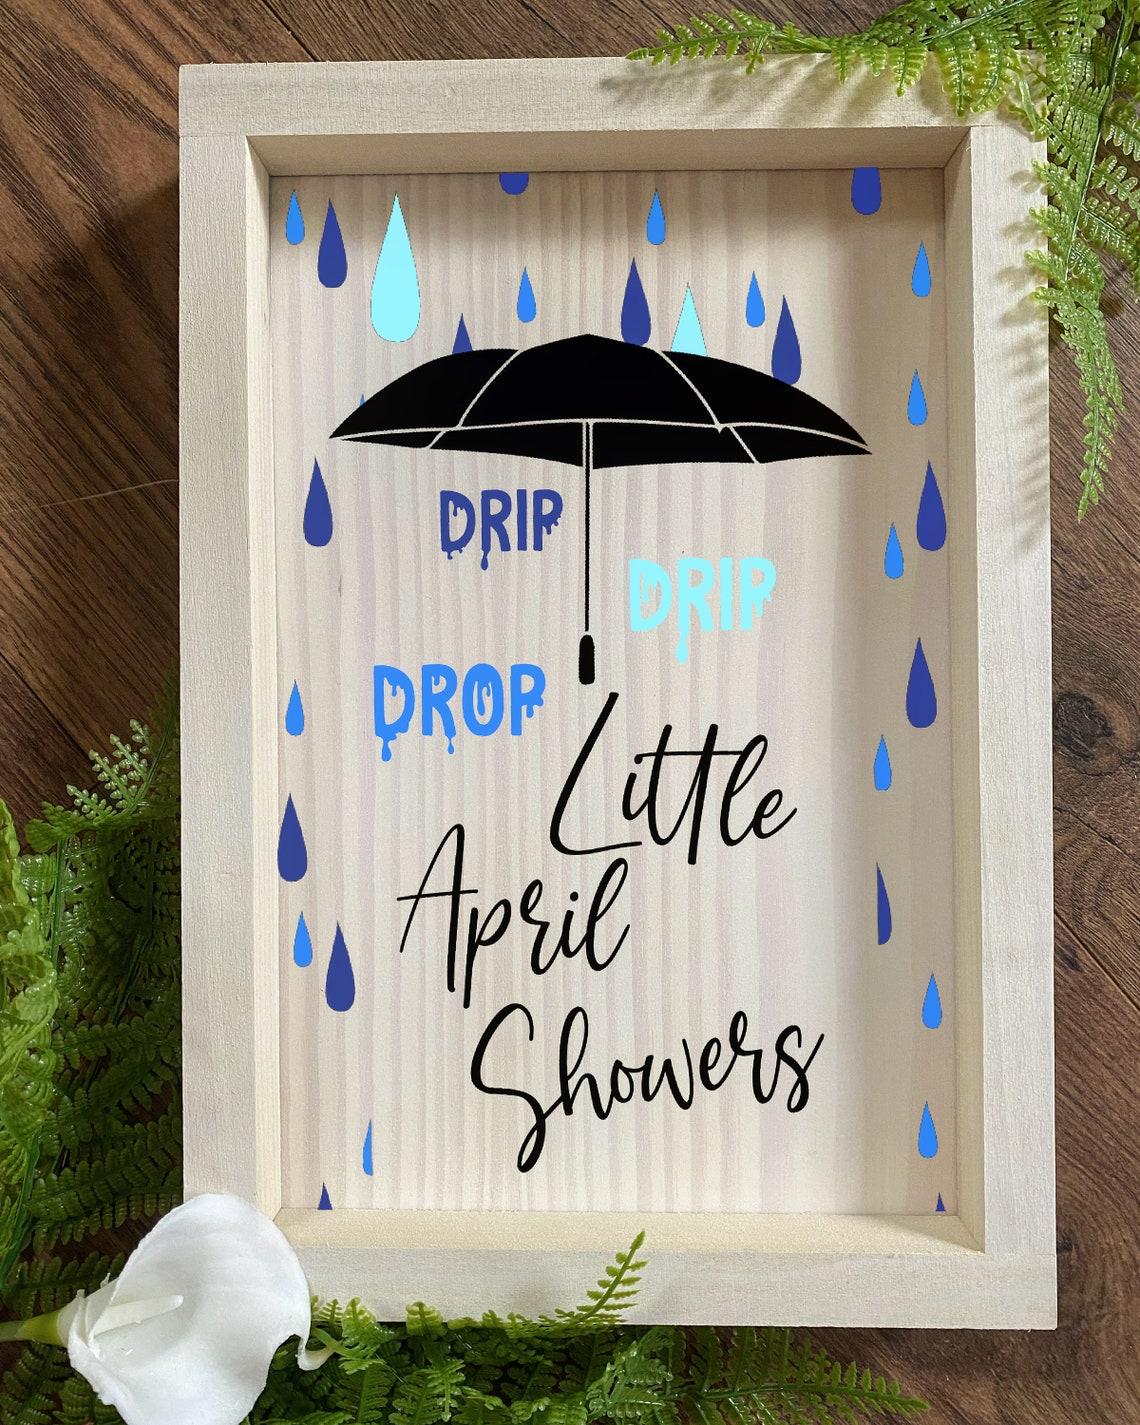 April Showers Lyrics Spring Disney Castle Farmhouse Rustic